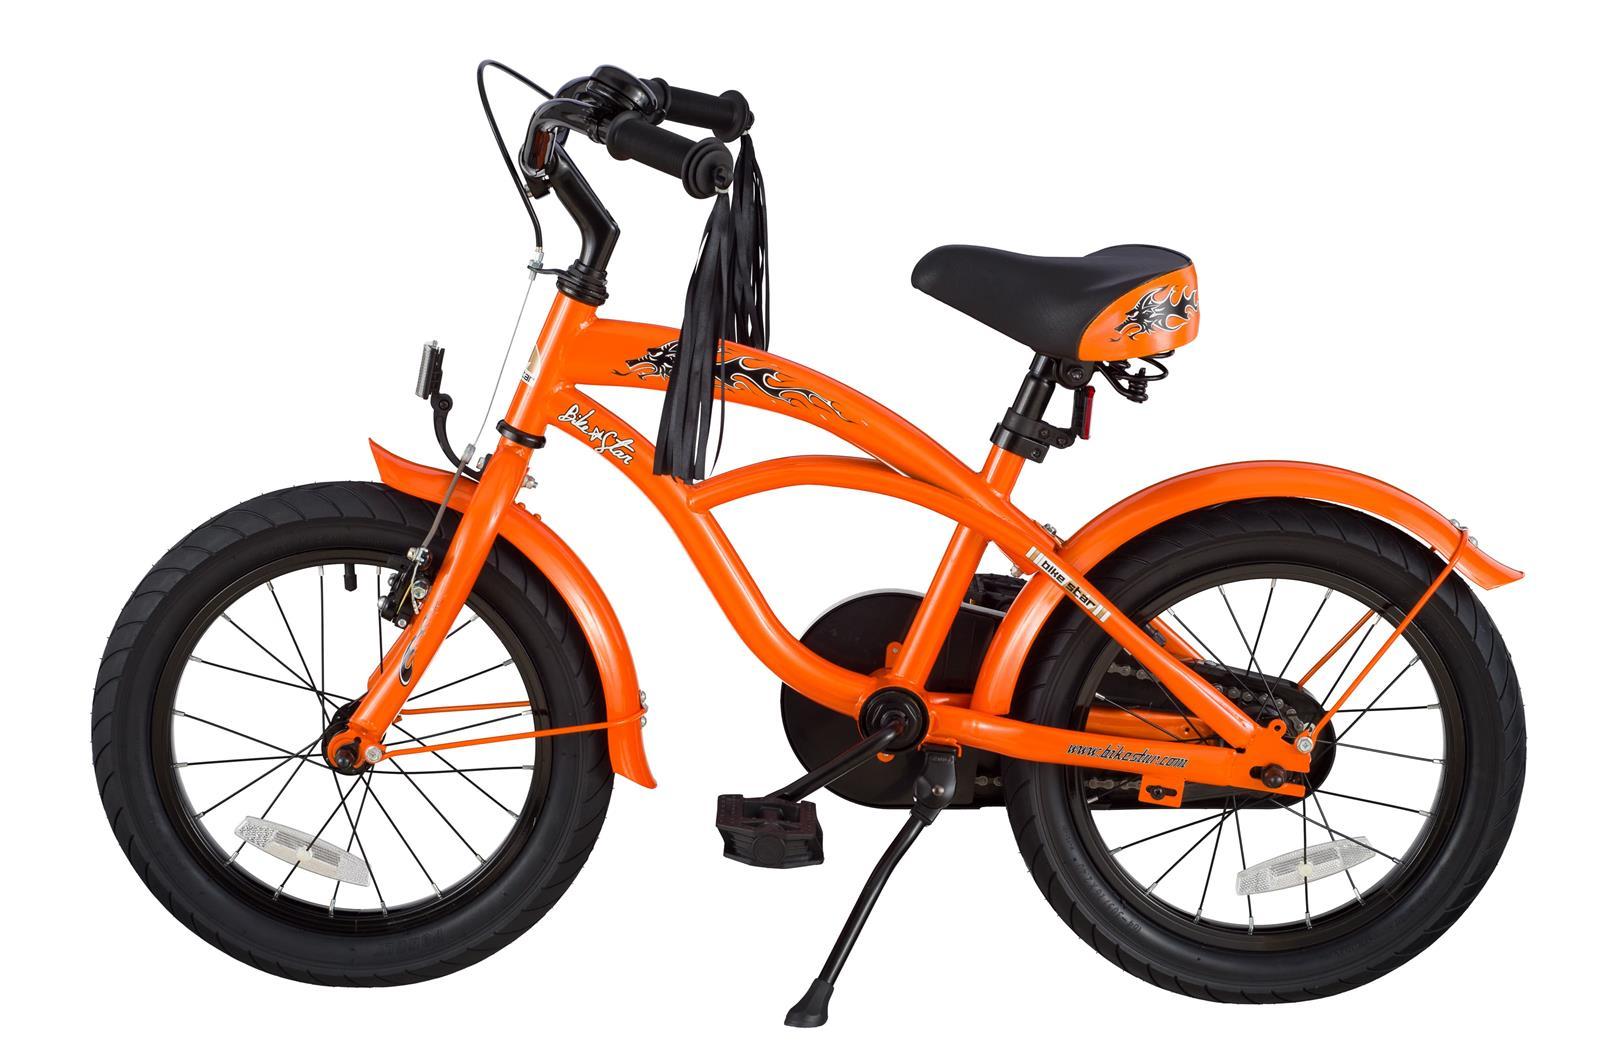 bi 16 cr 02 oran bikestar 16 zoll kindercruiser orange. Black Bedroom Furniture Sets. Home Design Ideas